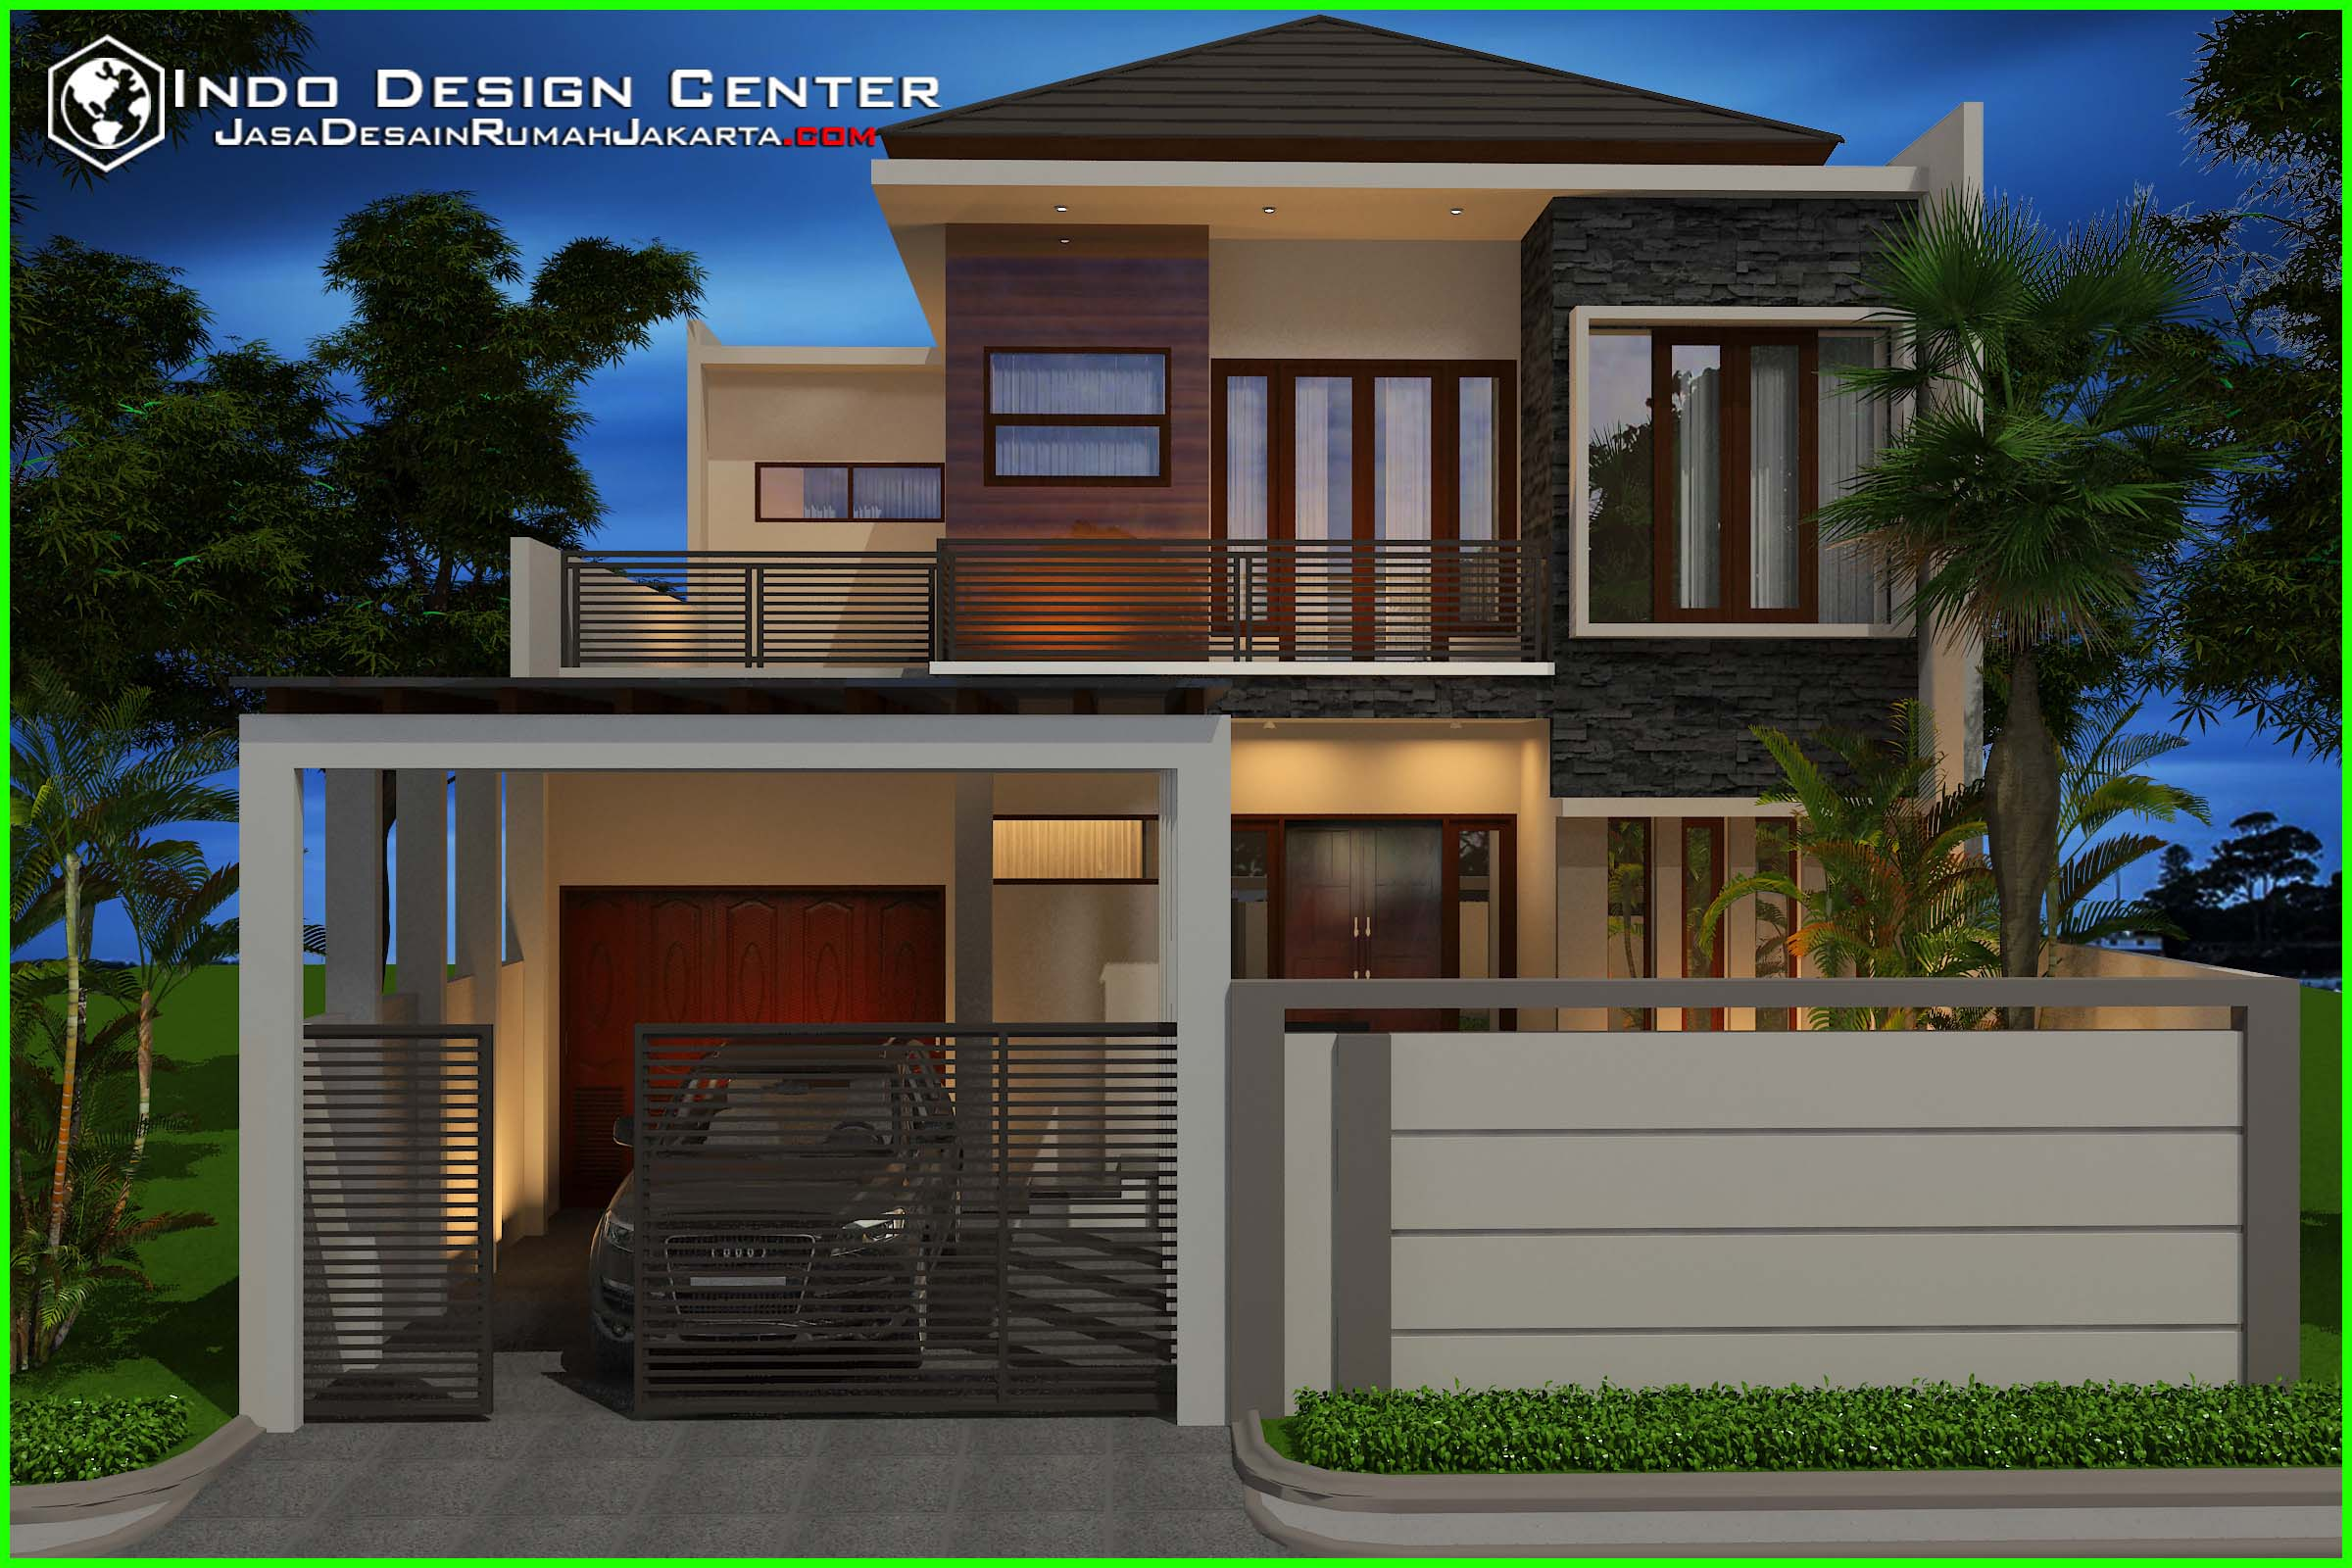 Gambar Gambar Rumah Tingkat Minimalis Jasa Desain Jakarta